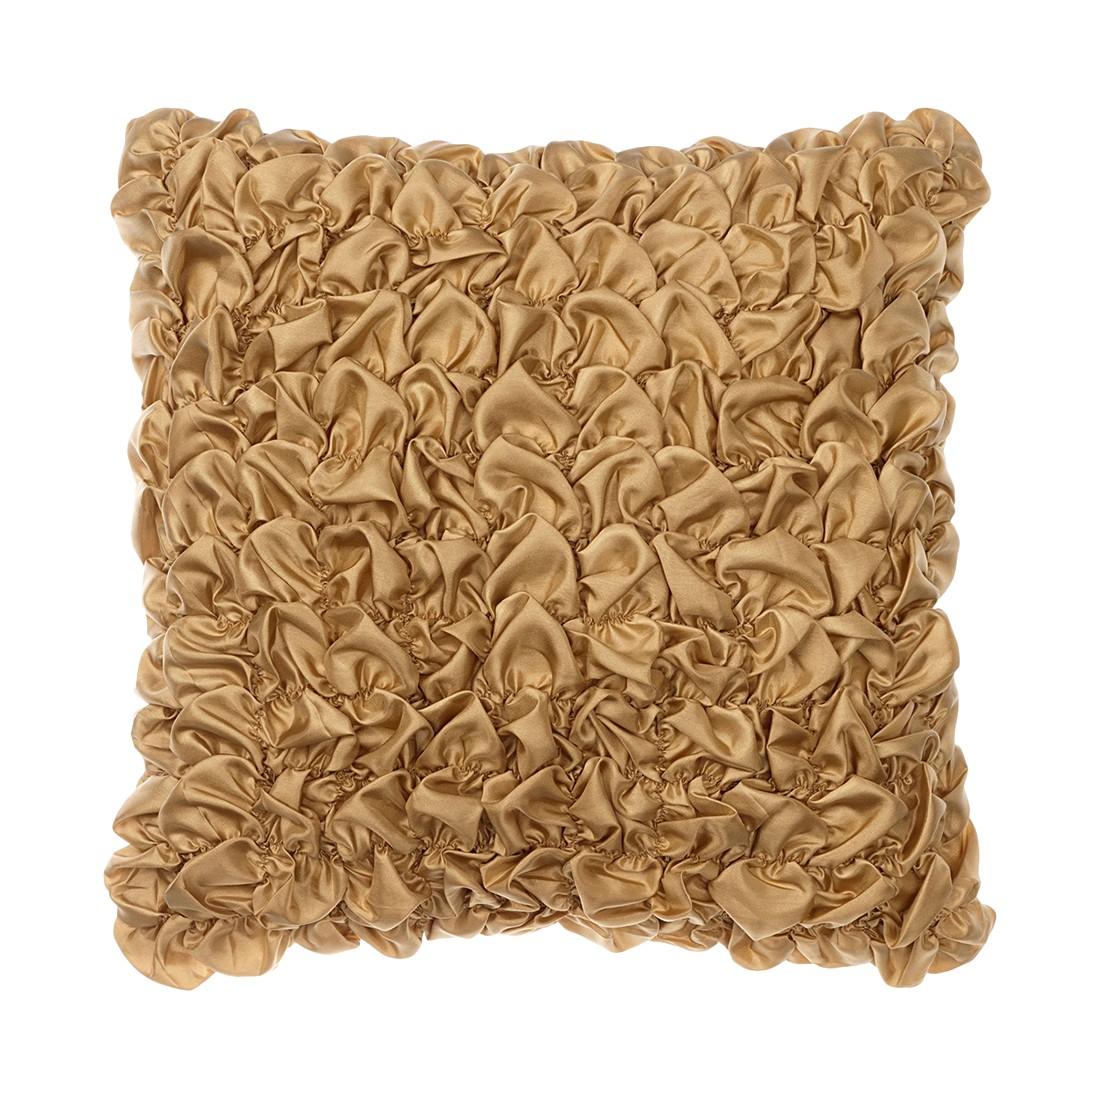 Kissen Cesana – 45 X 45 cm, Pink, Polyester – Kissenhülle, mit Füllung, Dutch Decor online bestellen